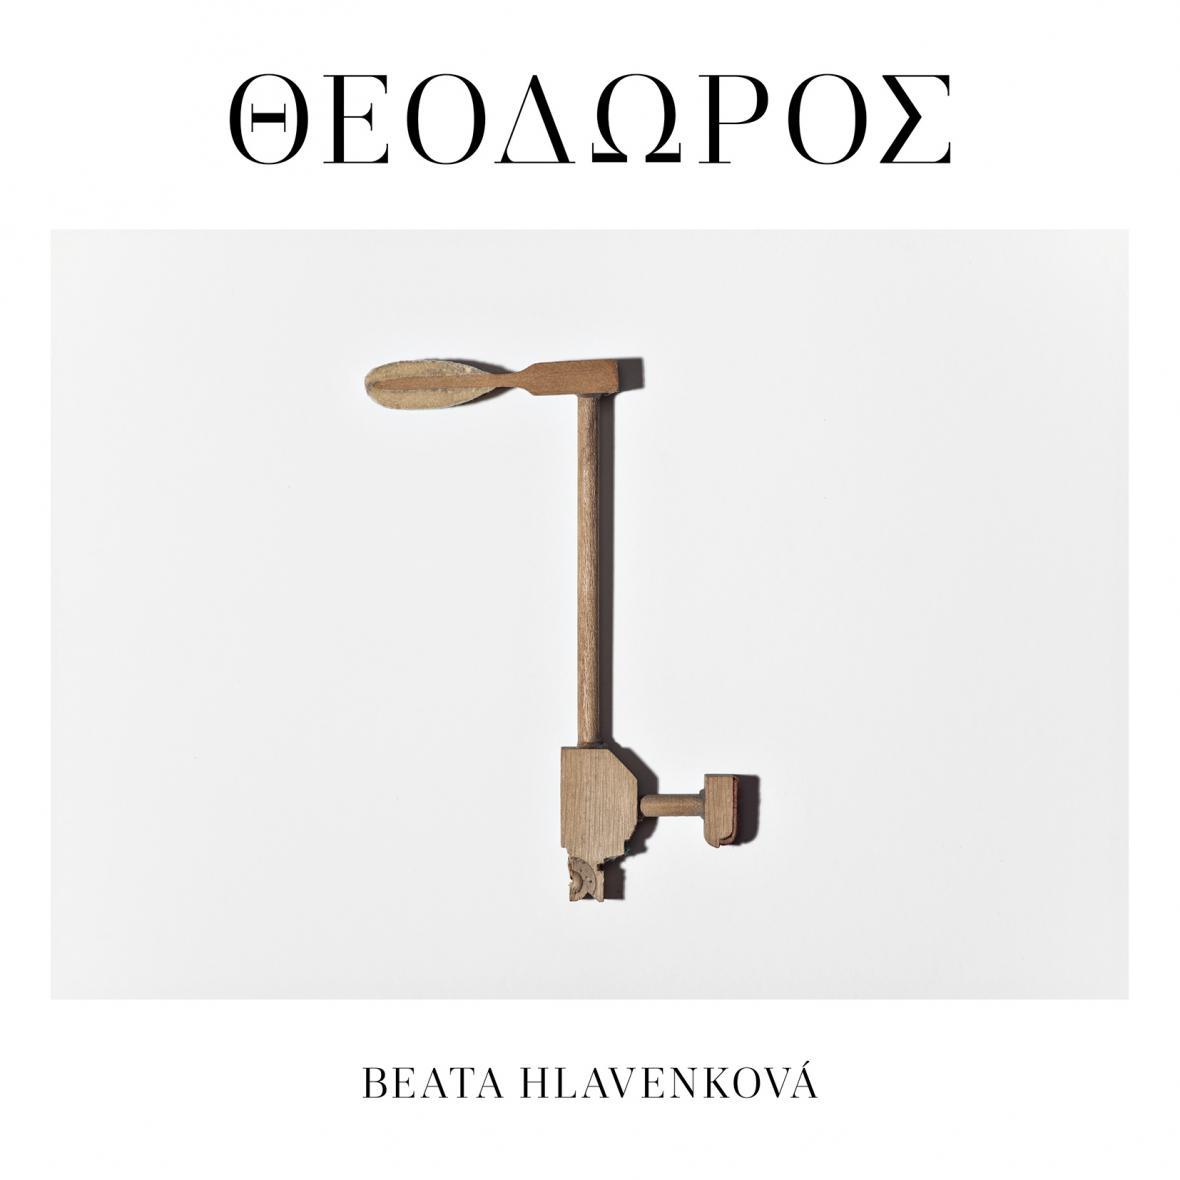 Beata Hlavenková / Theodoros